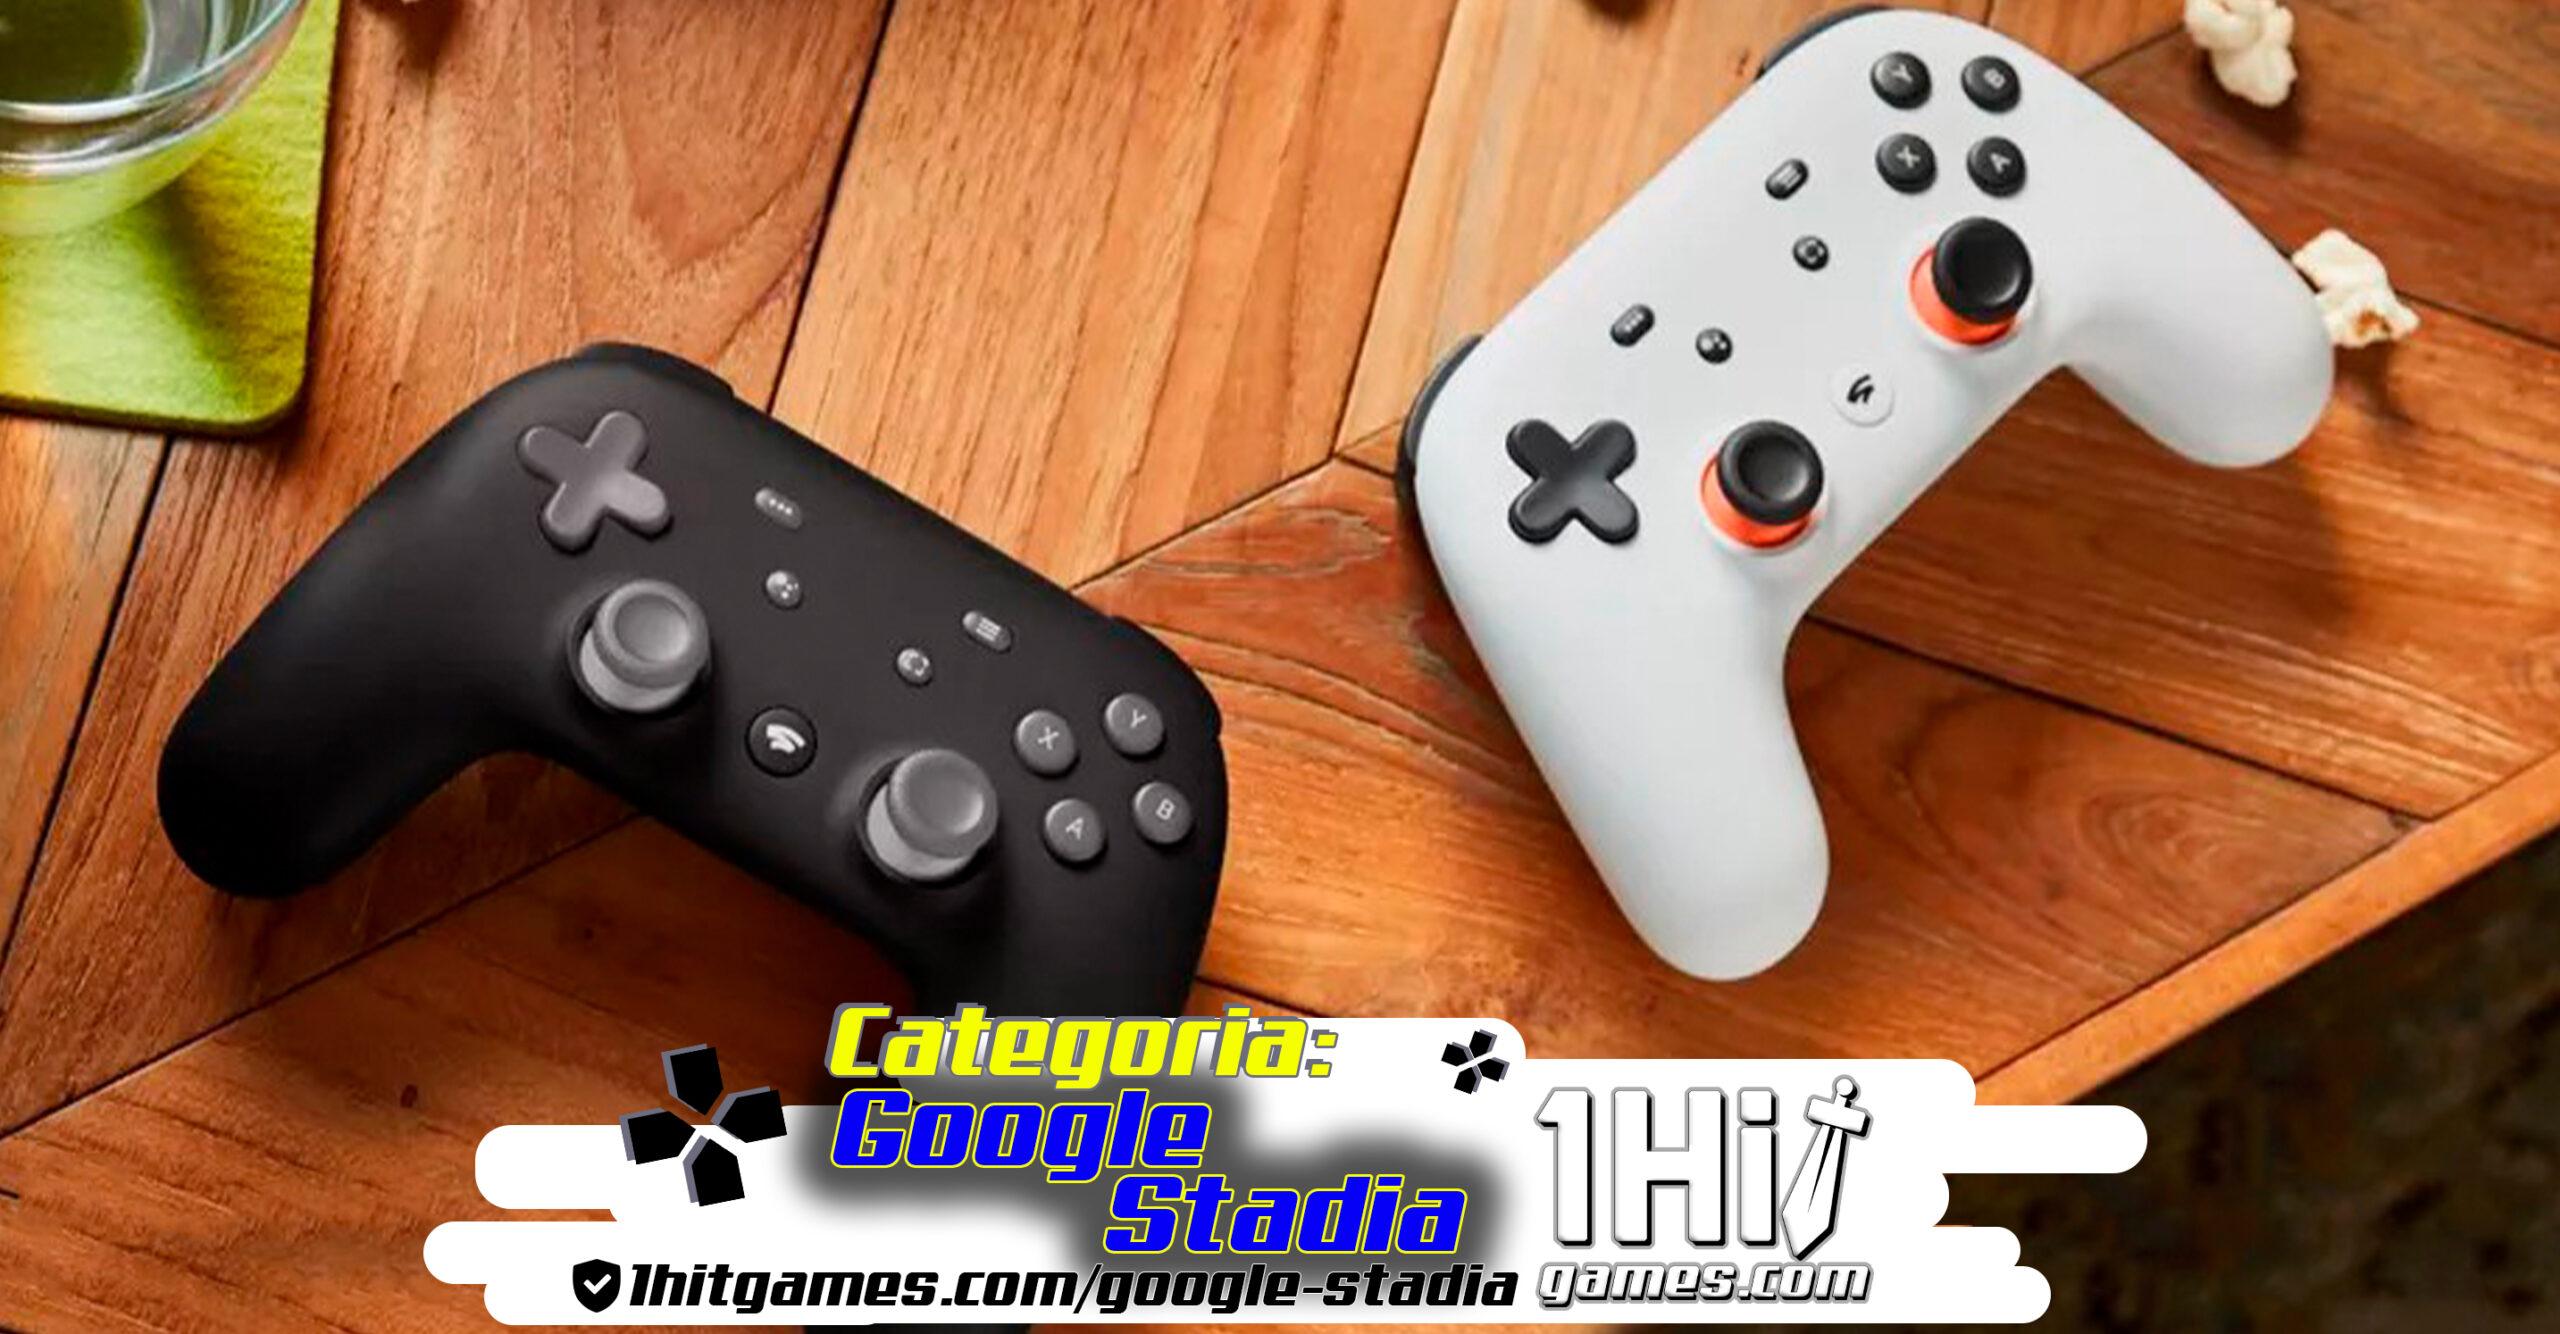 google stadia streaming games controle joystick 1hitgames jogos eletronicos categorias 1hit DualShock Chromecast full hd